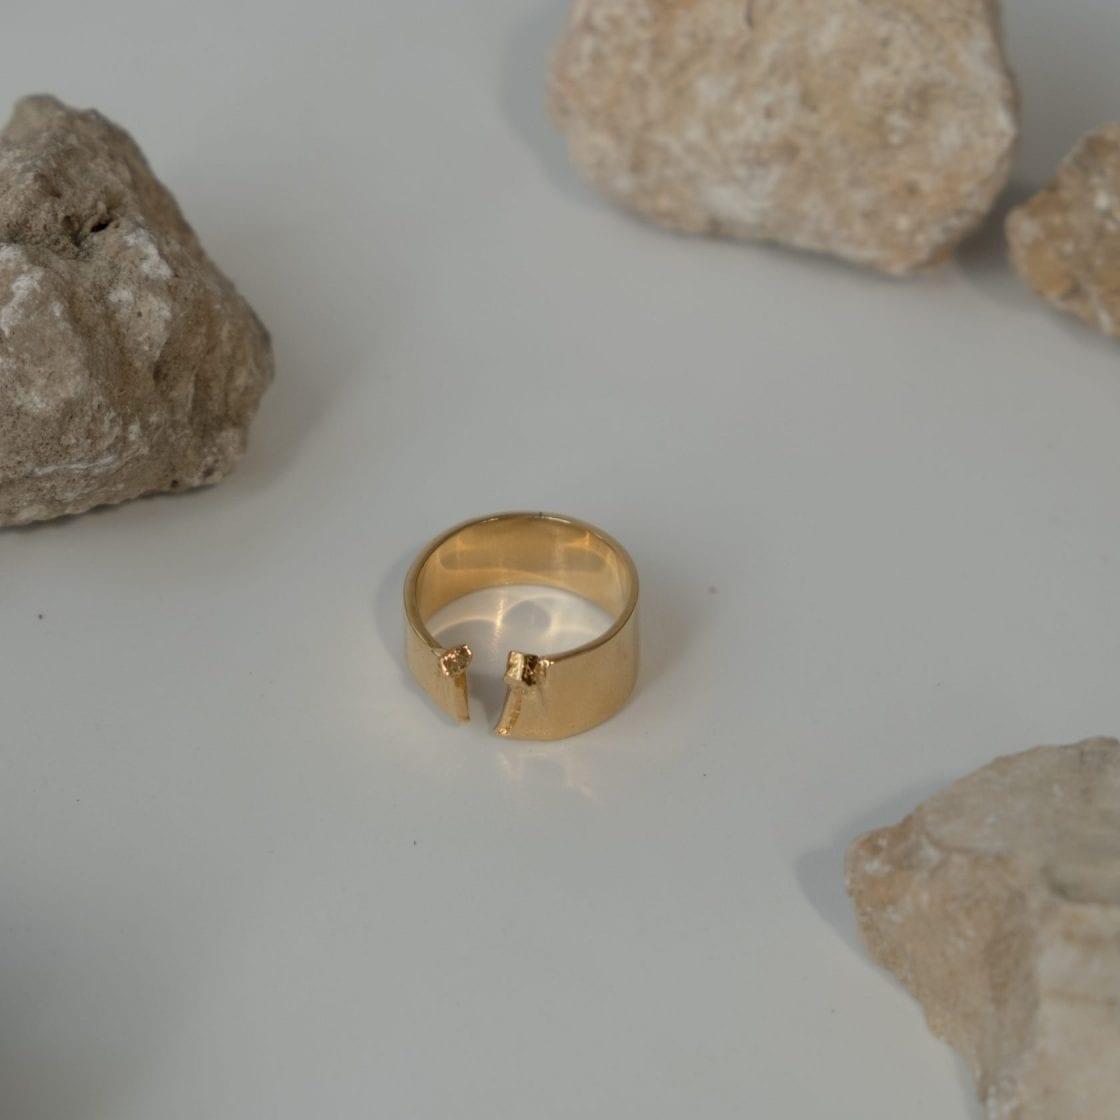 Sulfur 14K Gold Ring